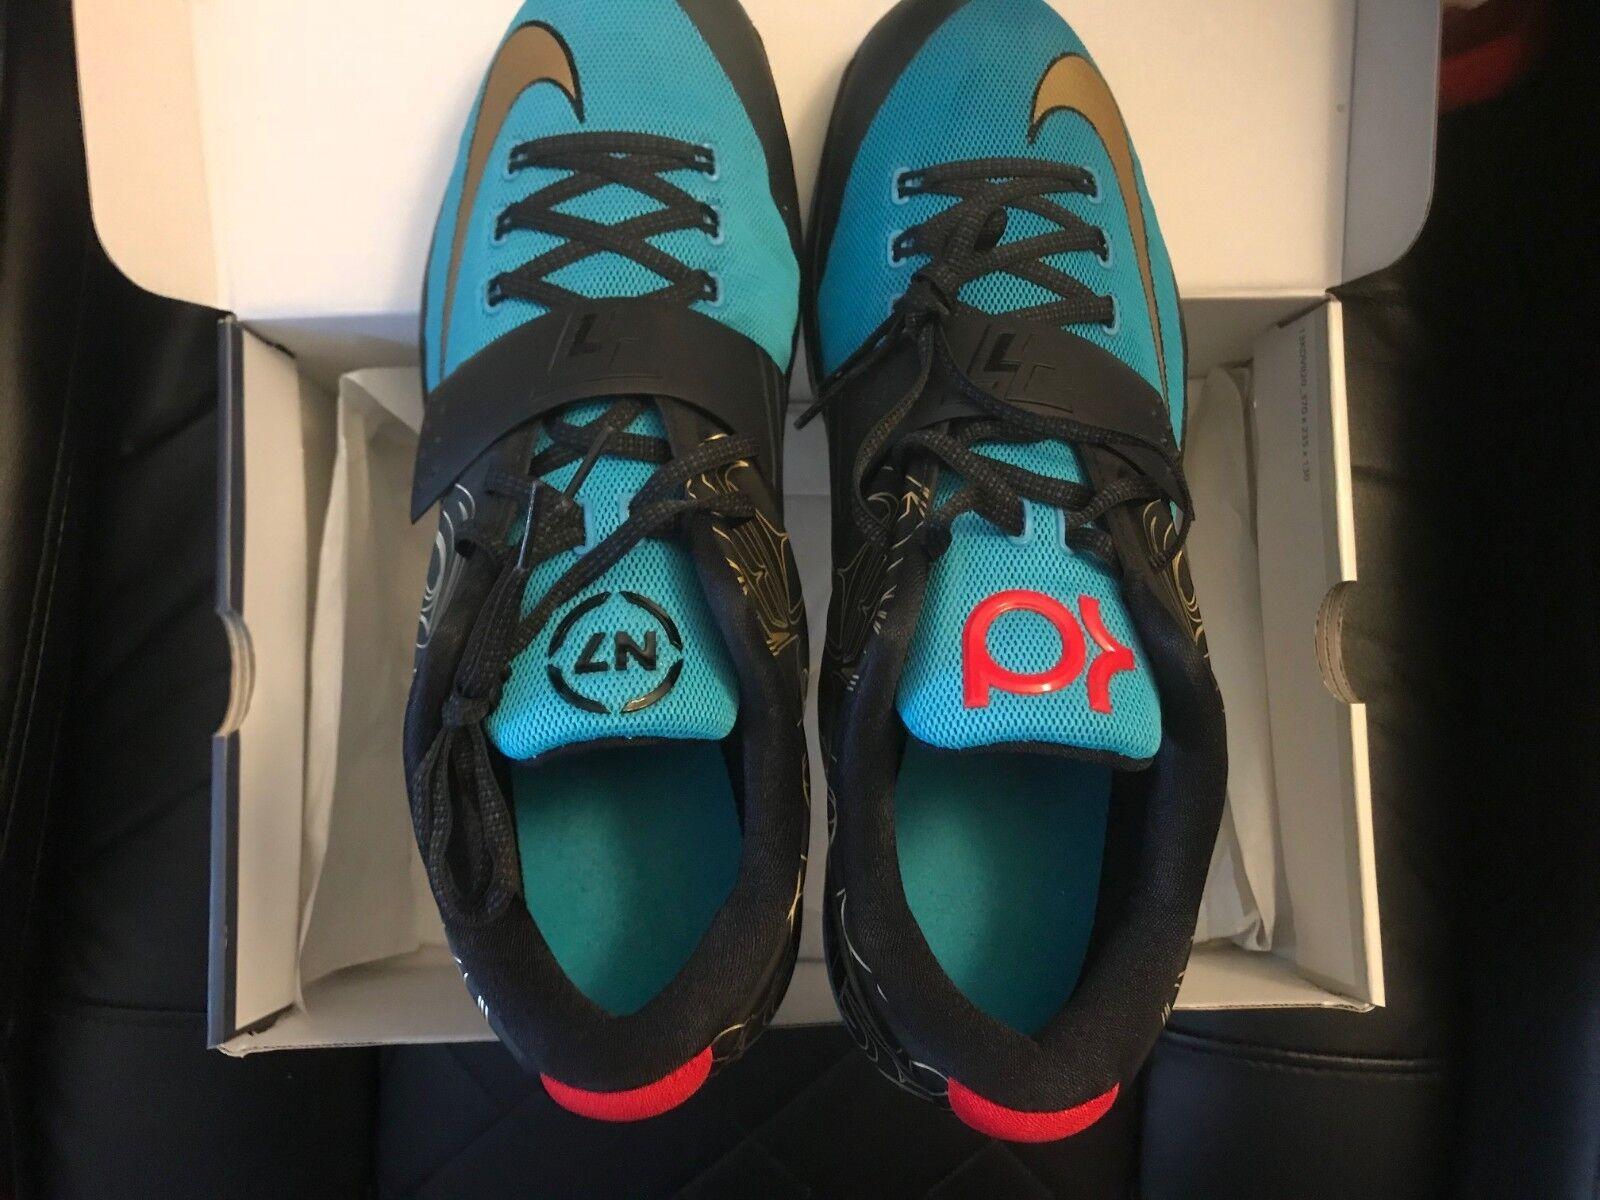 nike kd VII N7 size 14 Cheap women's shoes women's shoes